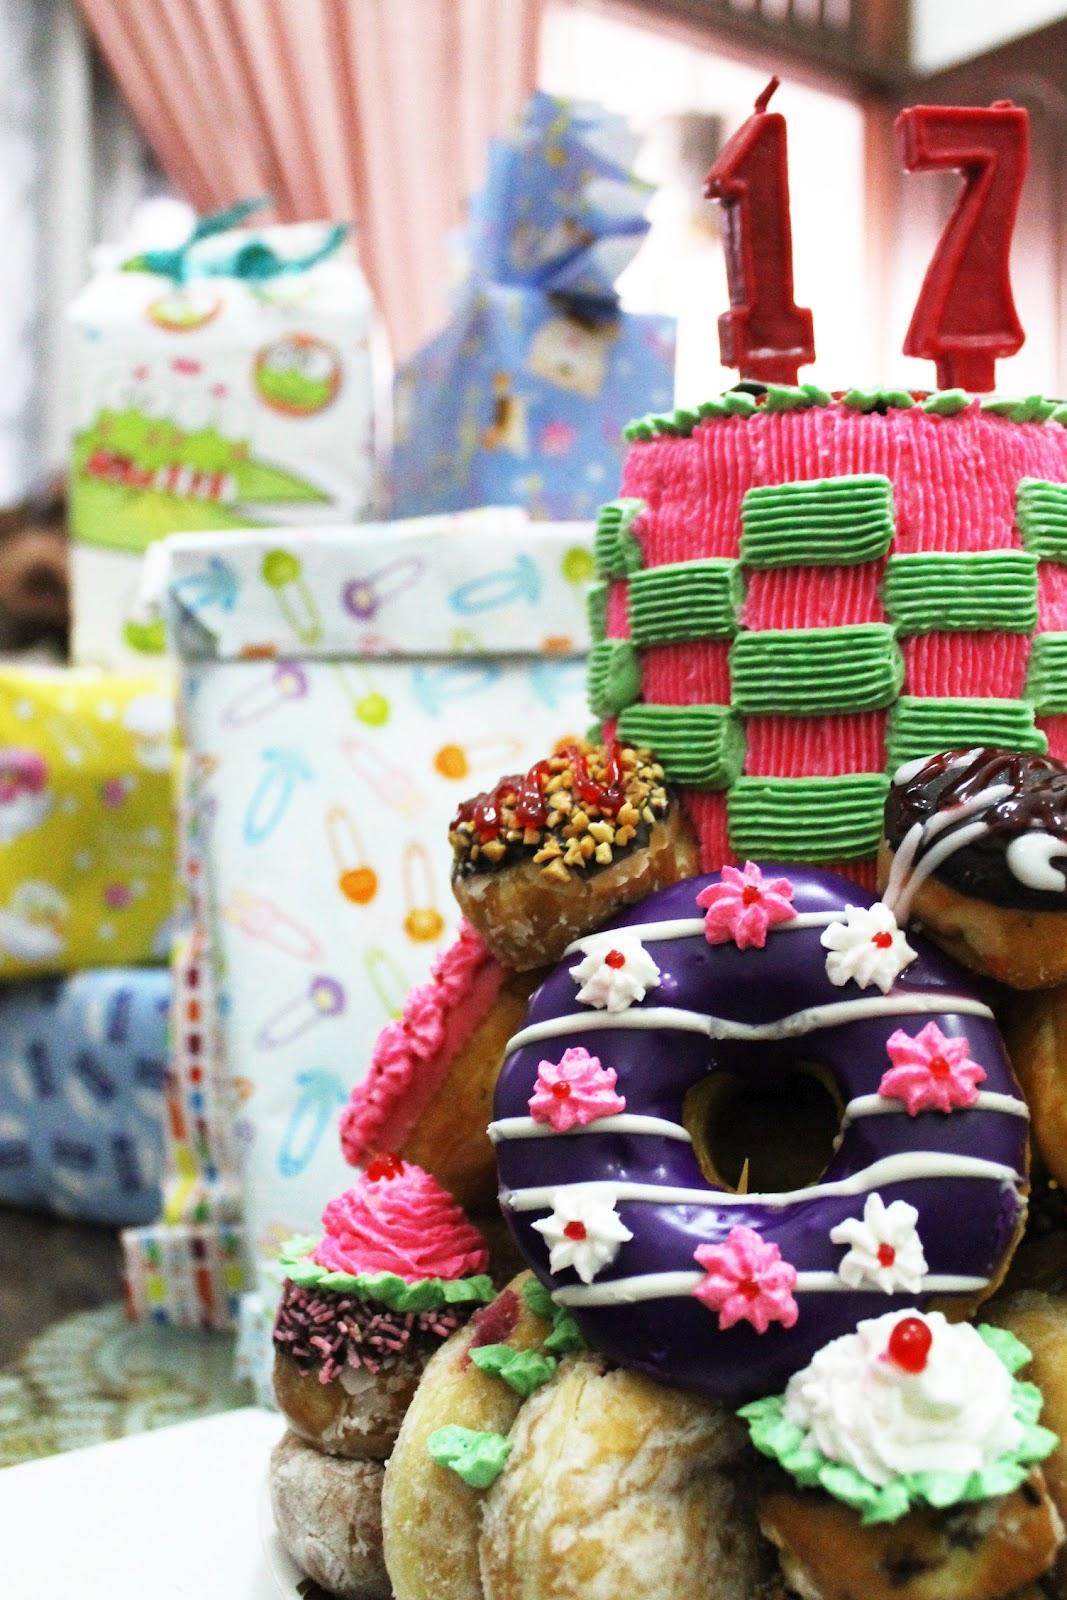 BELAS 17TH PRETTY DUNKIN DONUTS BIRTHDAY CAKE